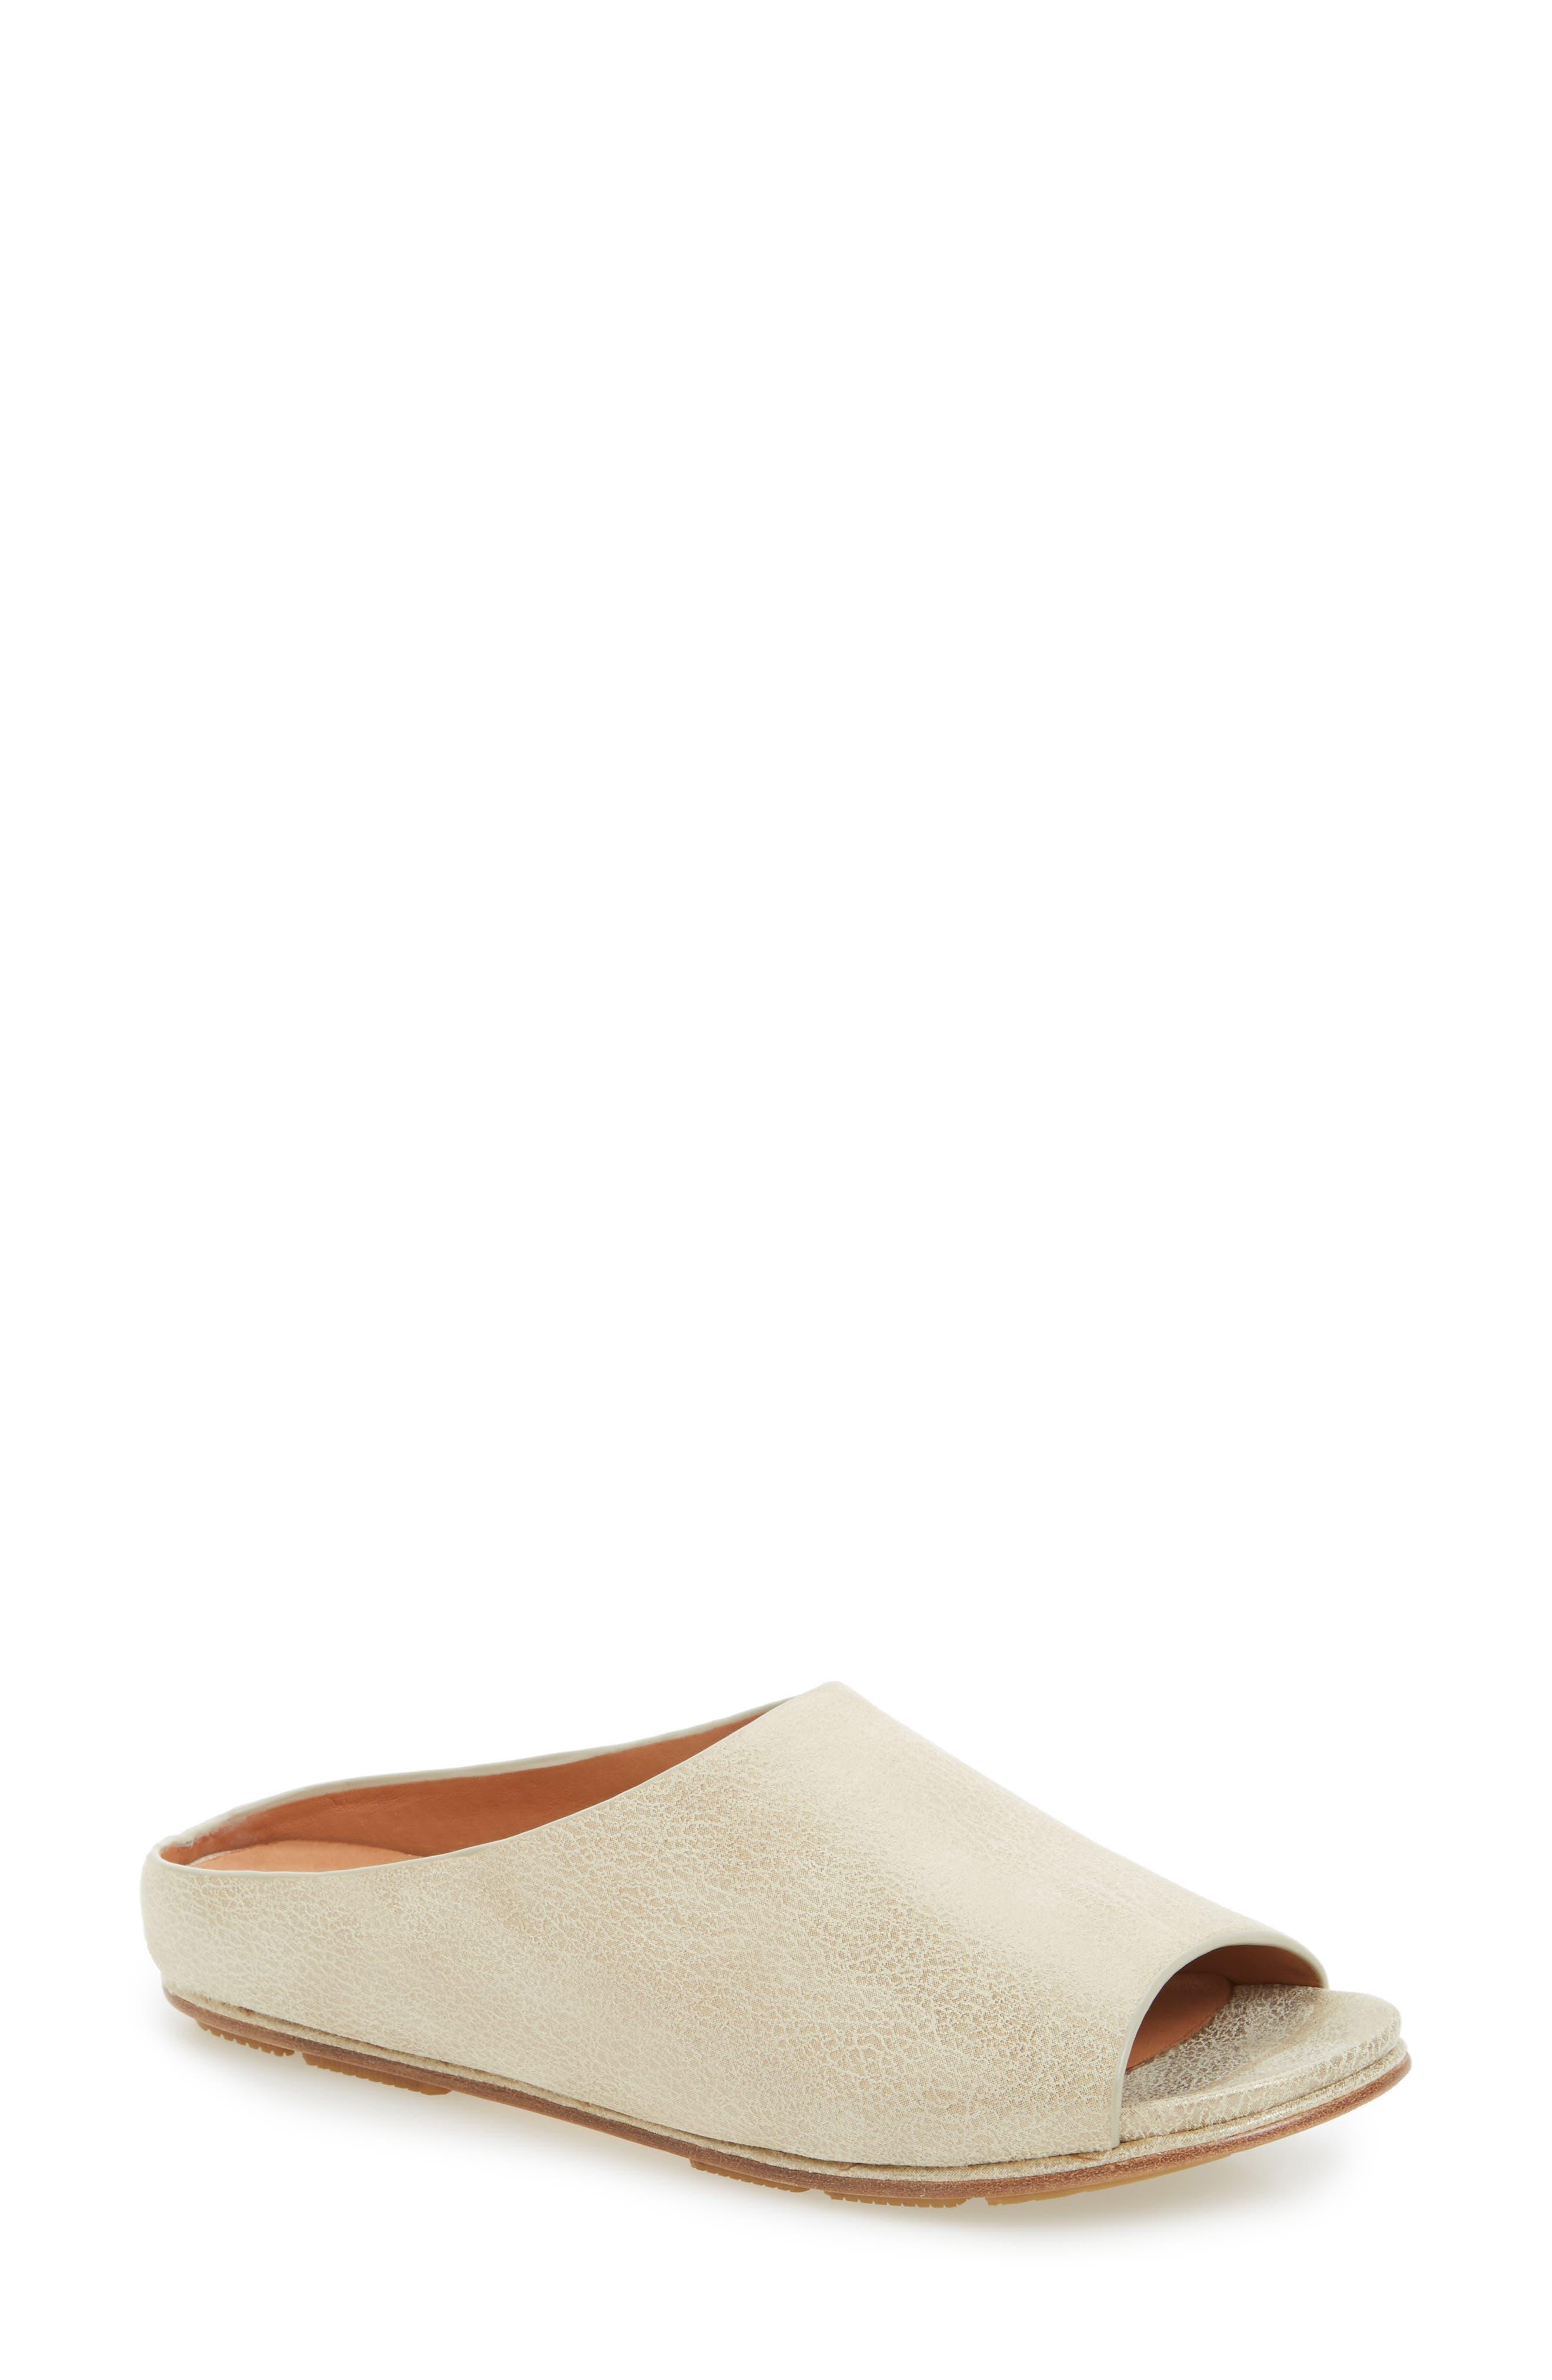 Last style Dijone Mule Women Womens White Leather L'Amour des Pieds Womens Comfort